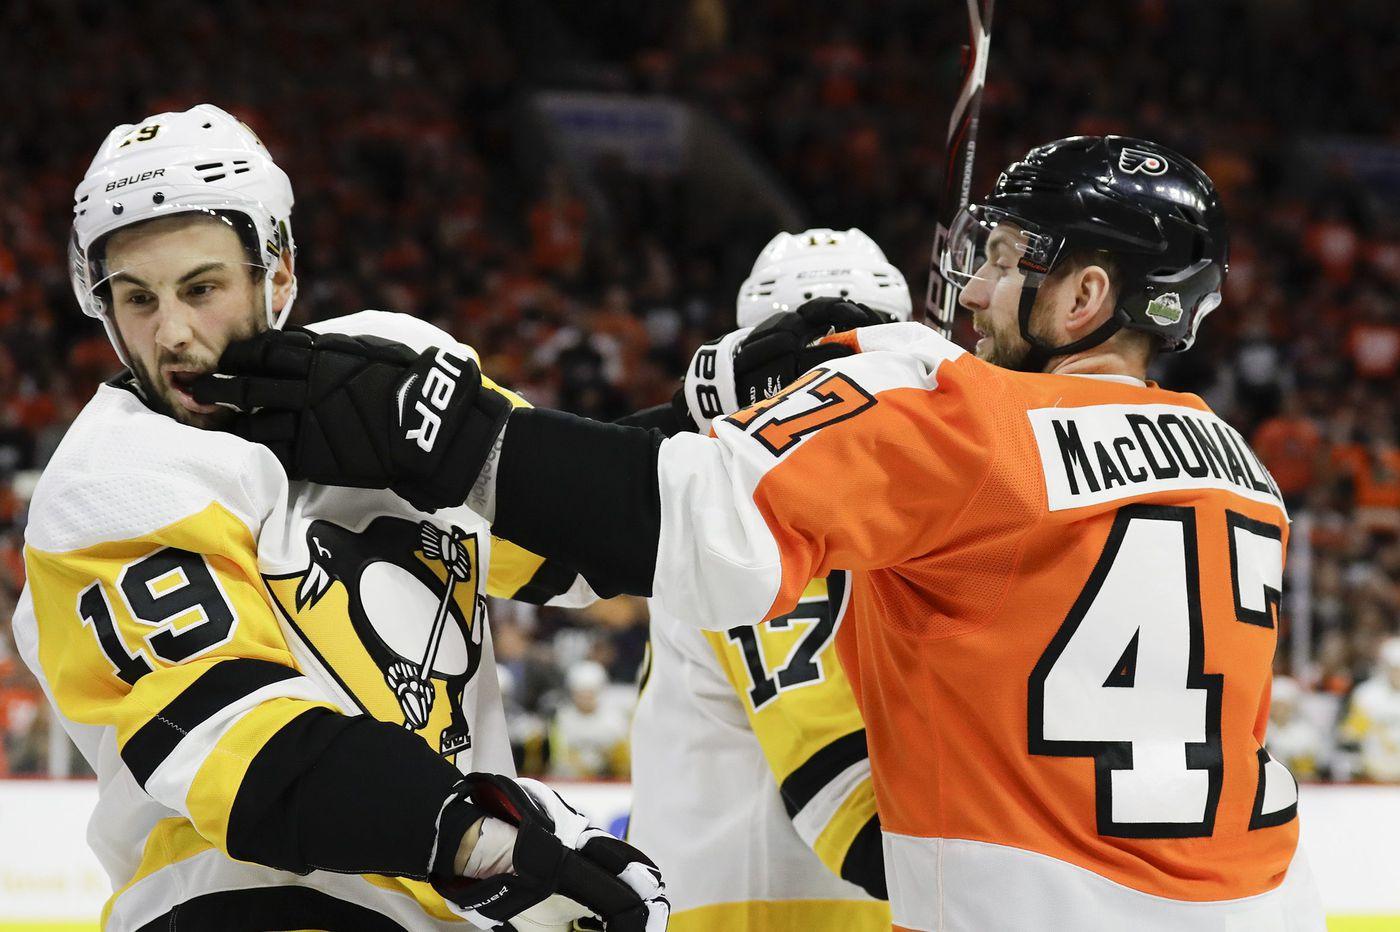 Flyers defenseman Andrew MacDonald eyes return; Morgan Frost, Isaac Ratcliffe sent to juniors